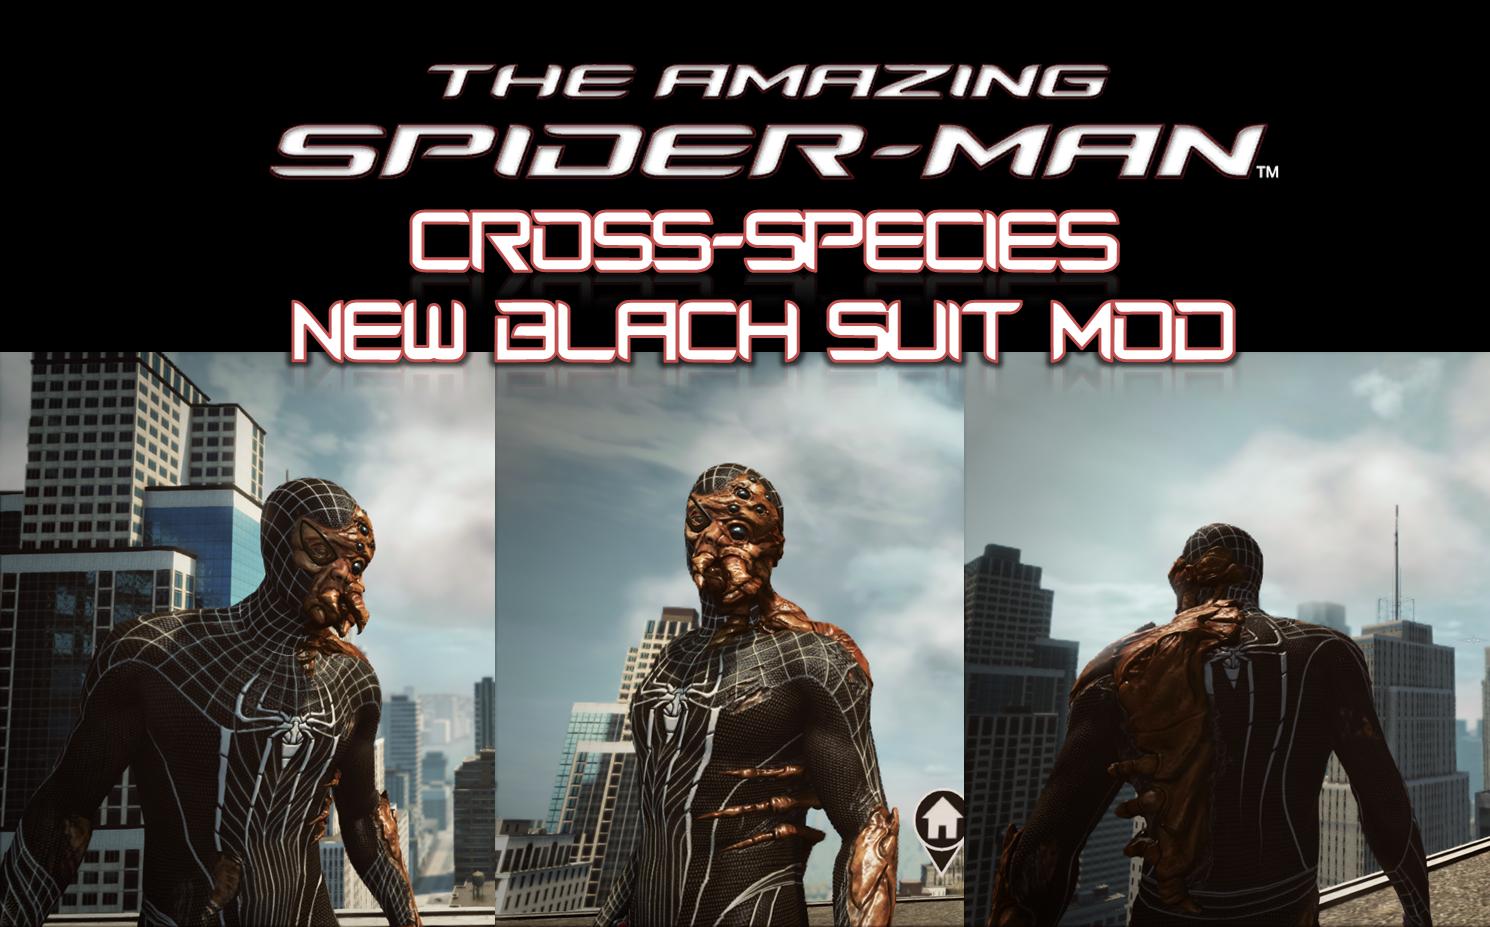 Cross-Species New Black Suit MOD by sanadsk5 on DeviantArt